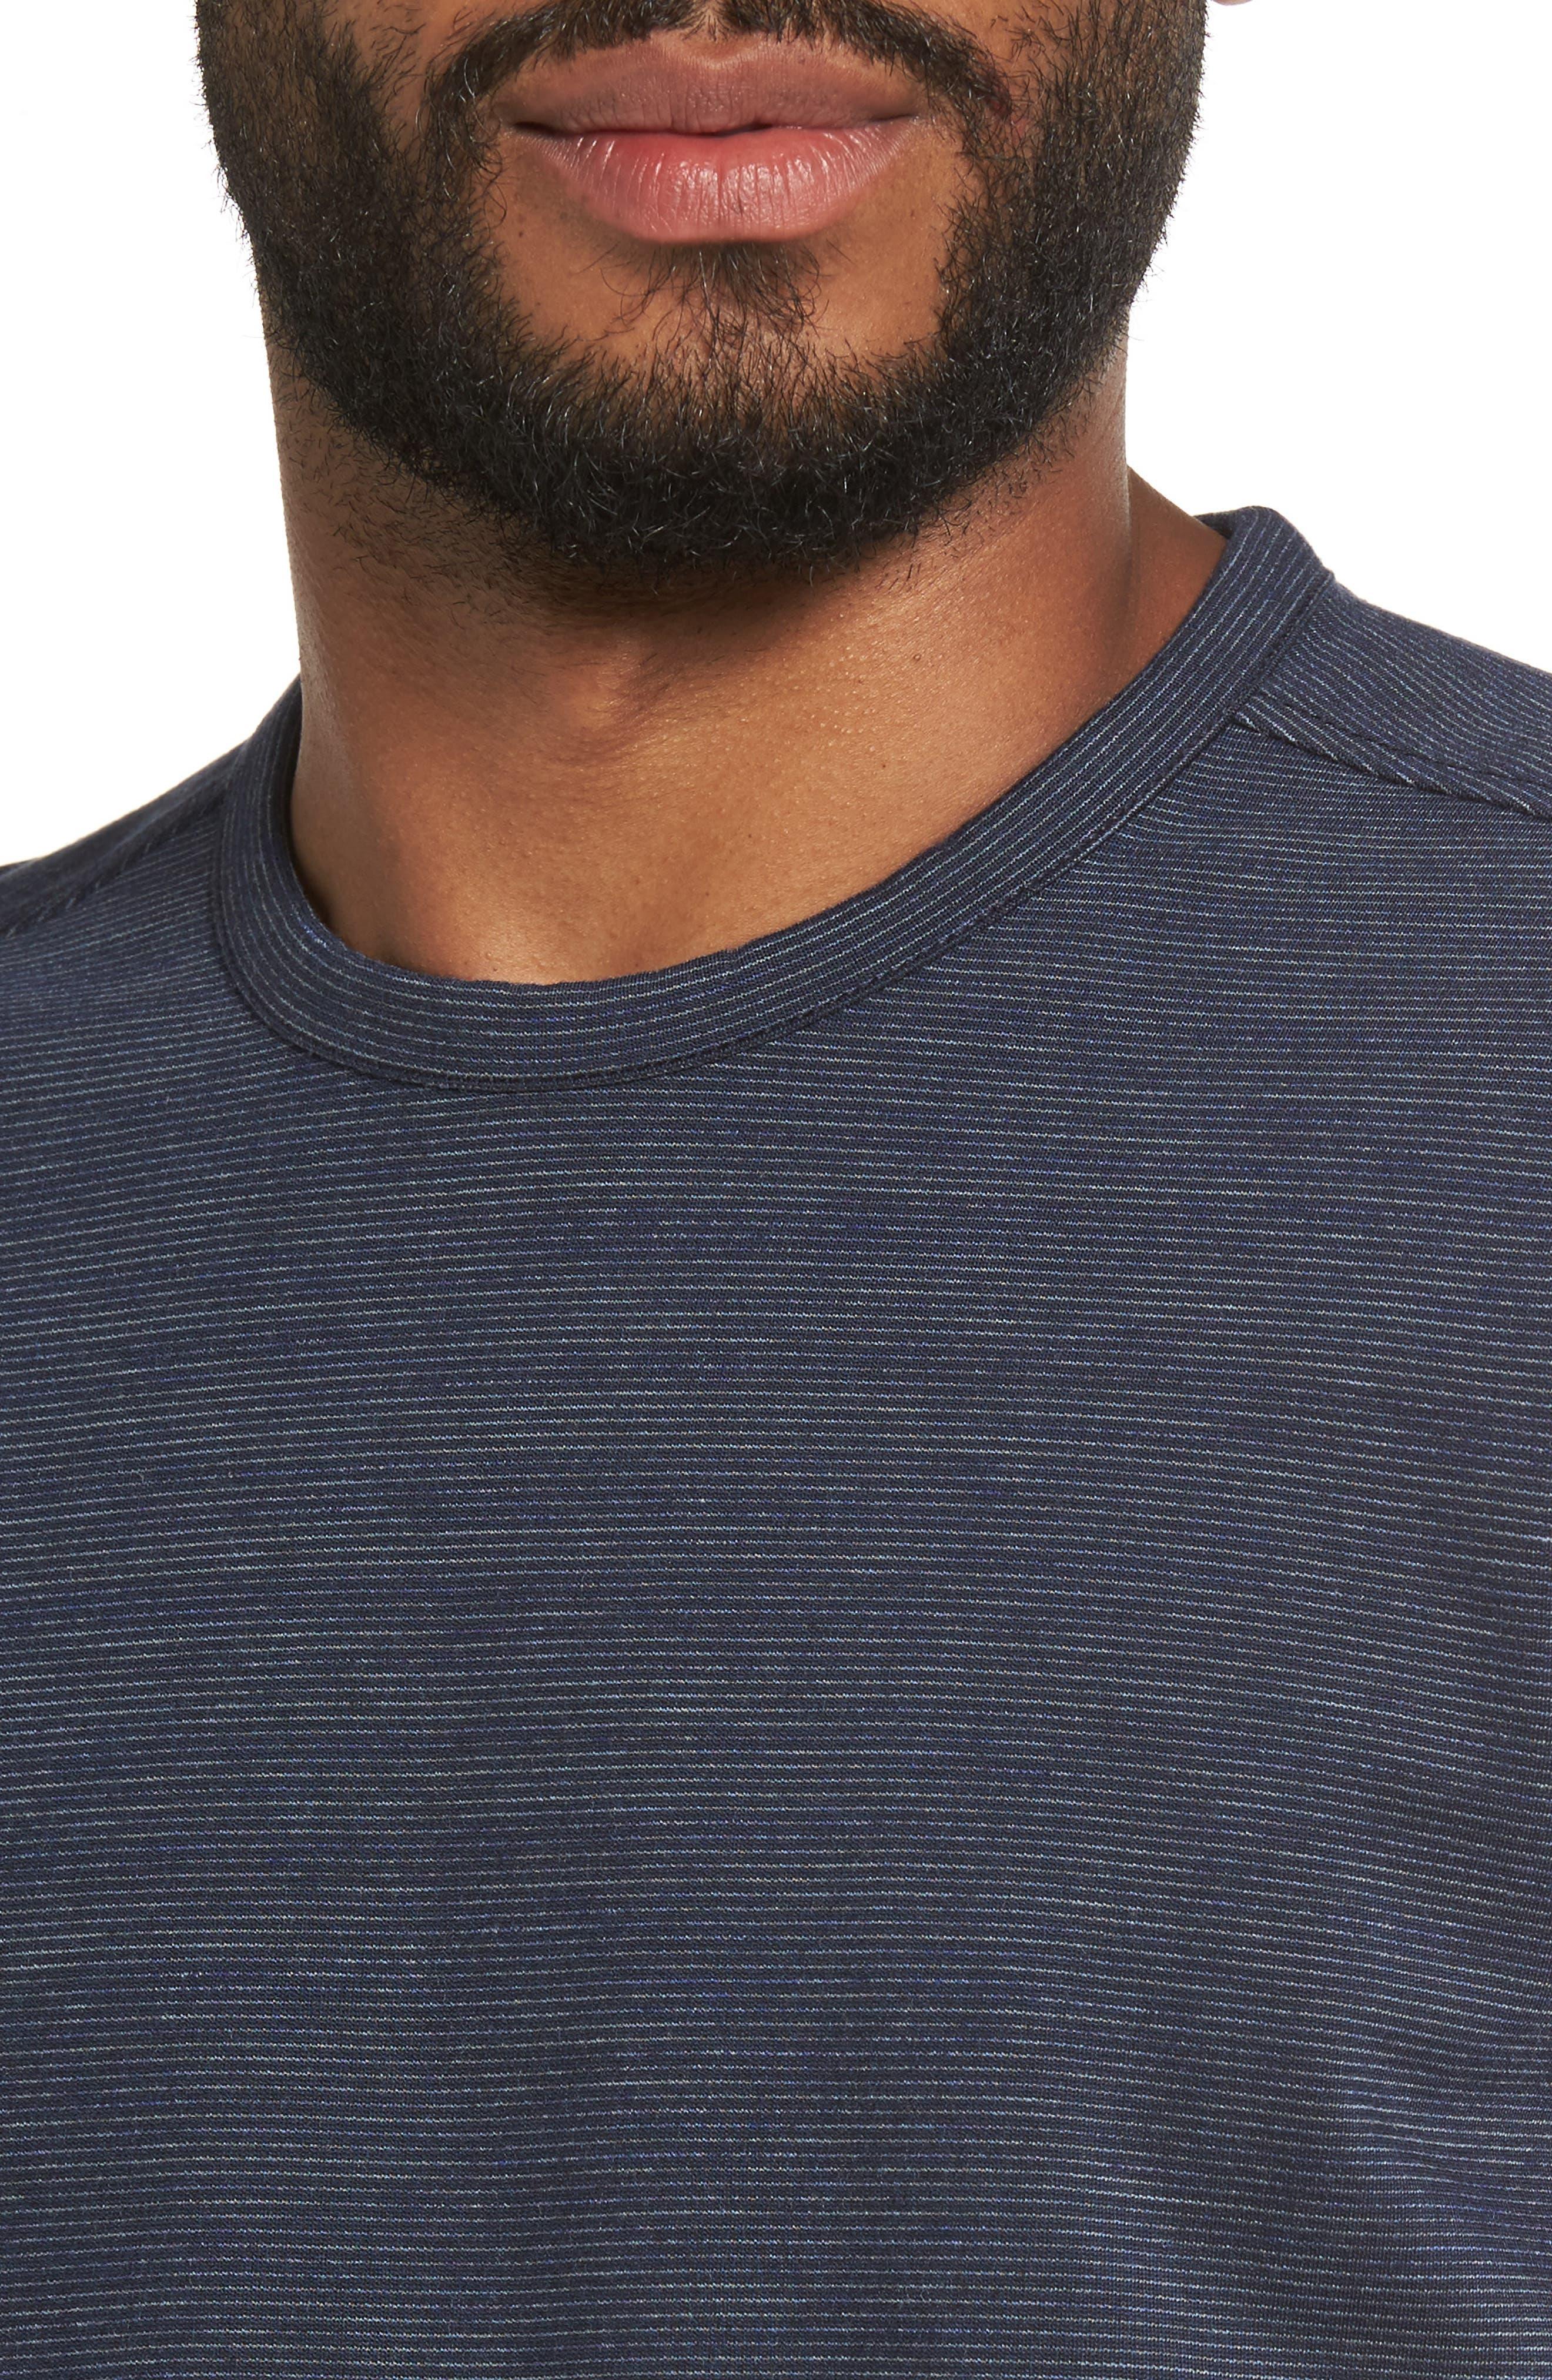 Space Dye Stripe Sweatshirt,                             Alternate thumbnail 4, color,                             Navy Night Spacedye